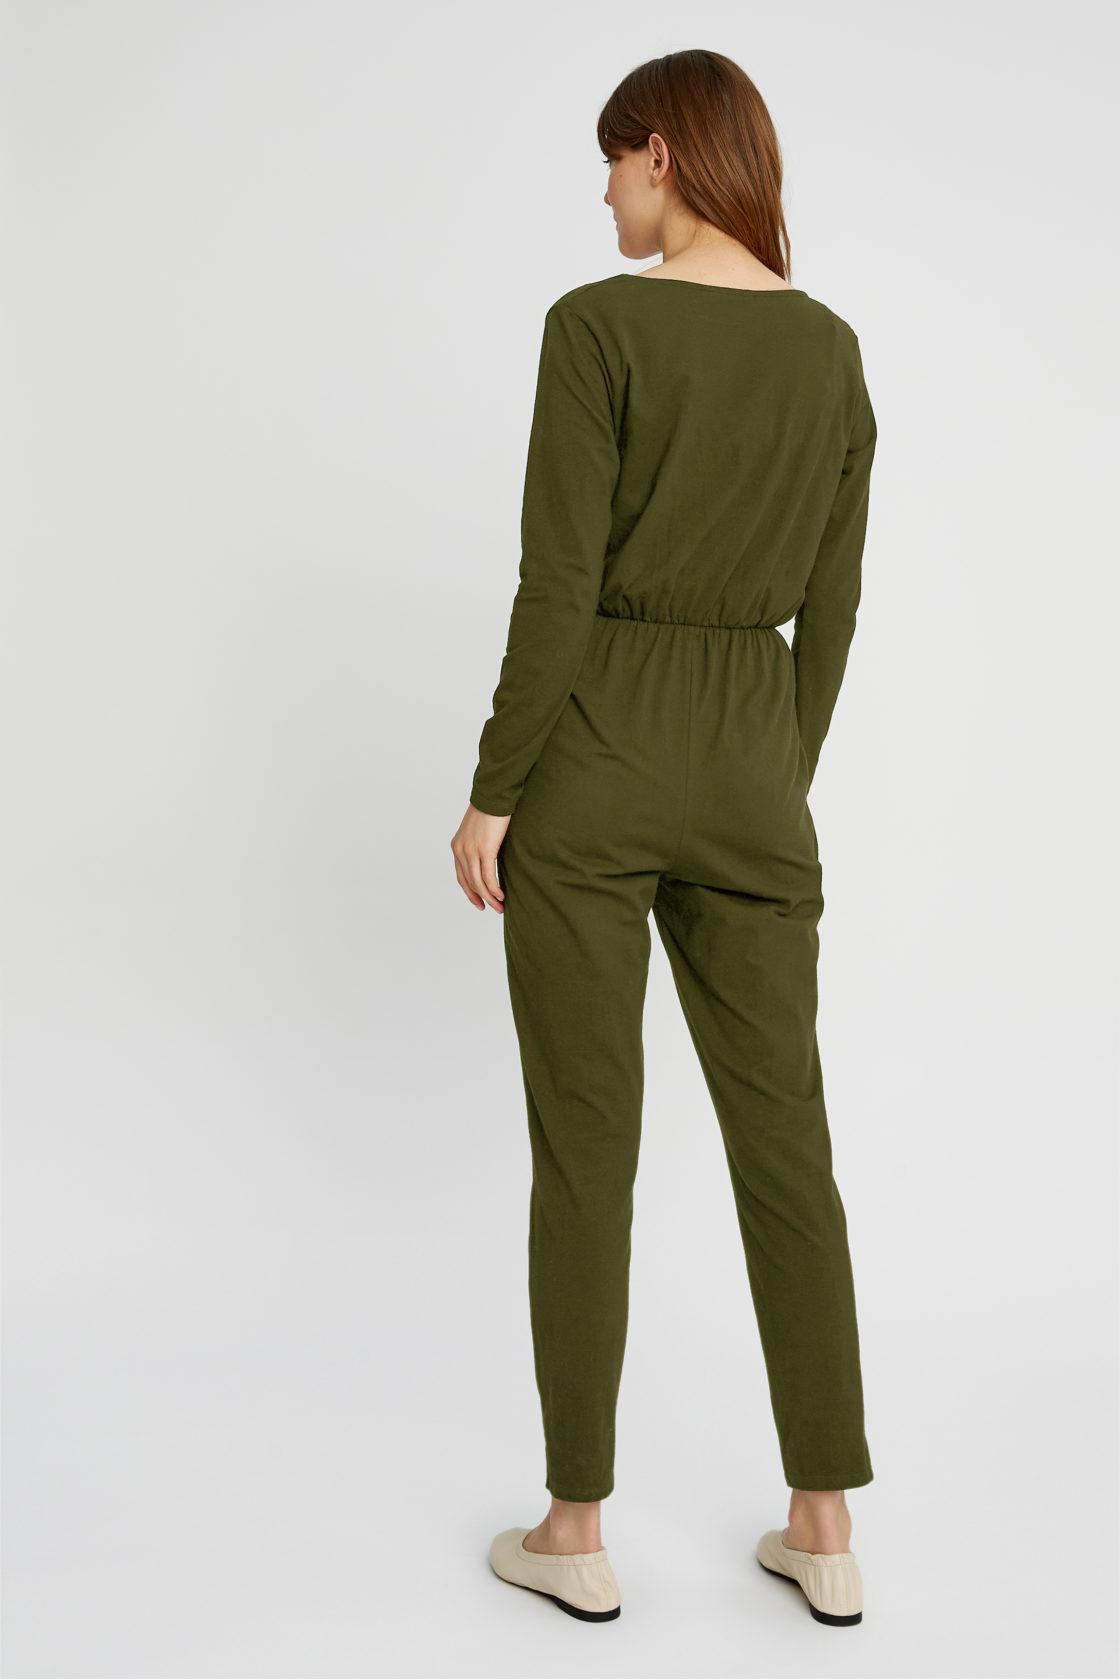 Roberta Organic Fashion Peopletree Jumpsuit Odette Khaki 2